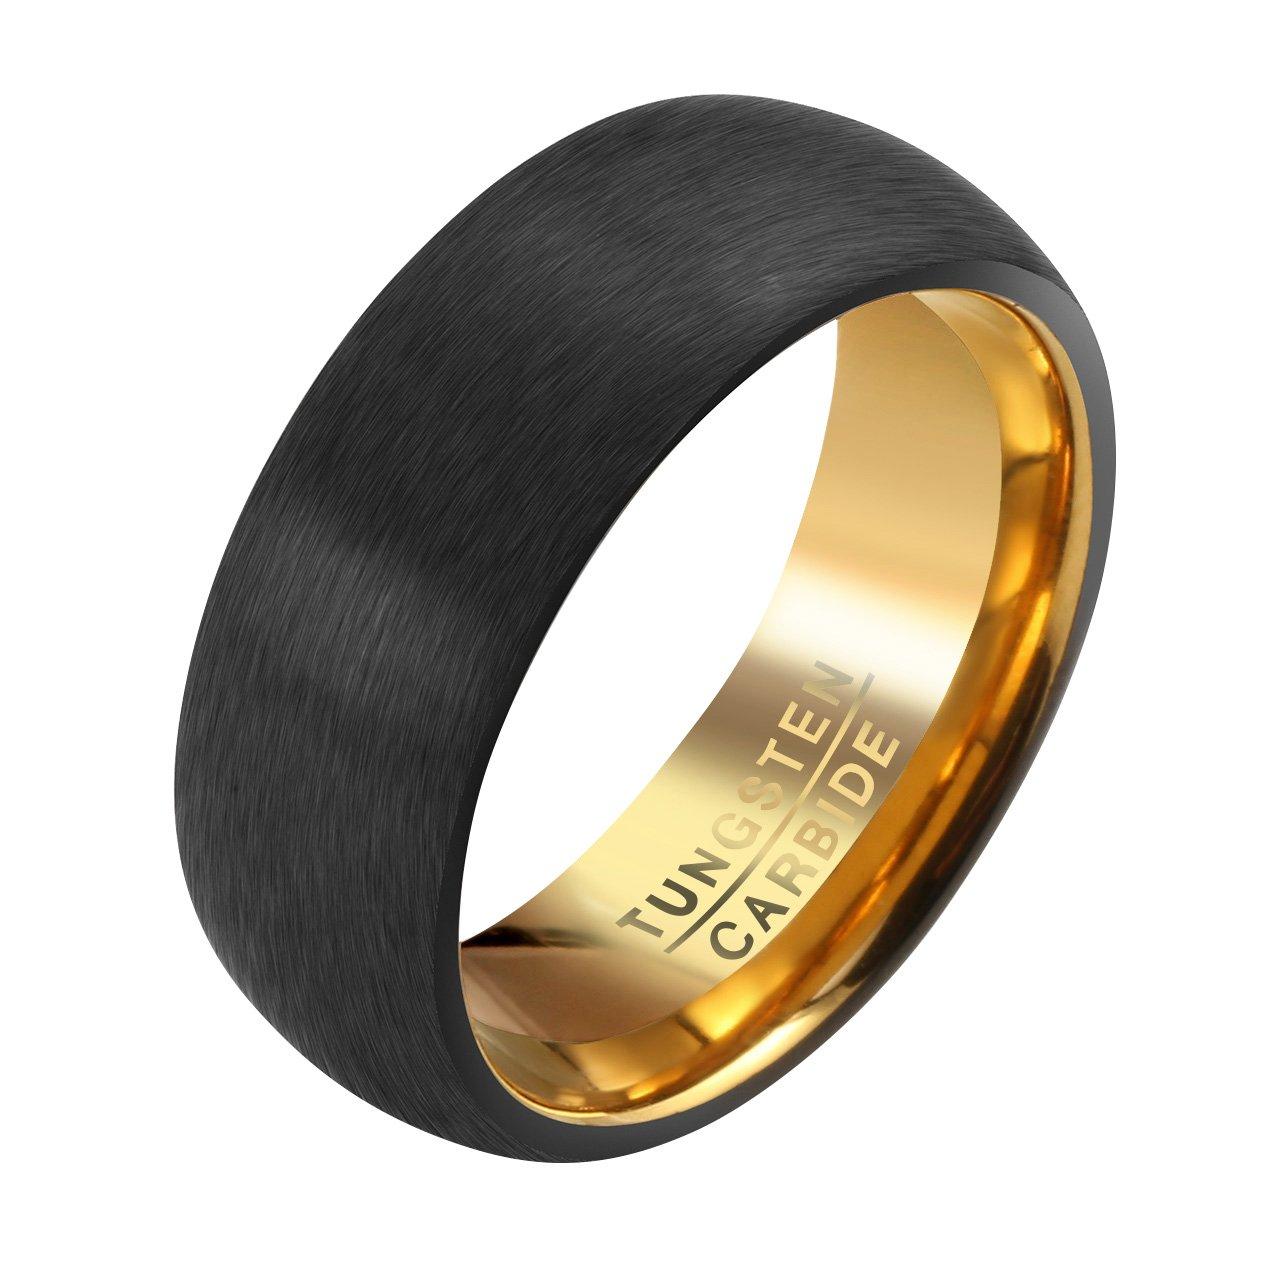 2293de85d01c Jovivi Custom Band Ring - Personalised Mens Tungsten Carbide Wedding Band  Black Golden 8mm Comfort Fit Brushed Matte Finish Rings Size V 1 2   Amazon.co.uk  ...